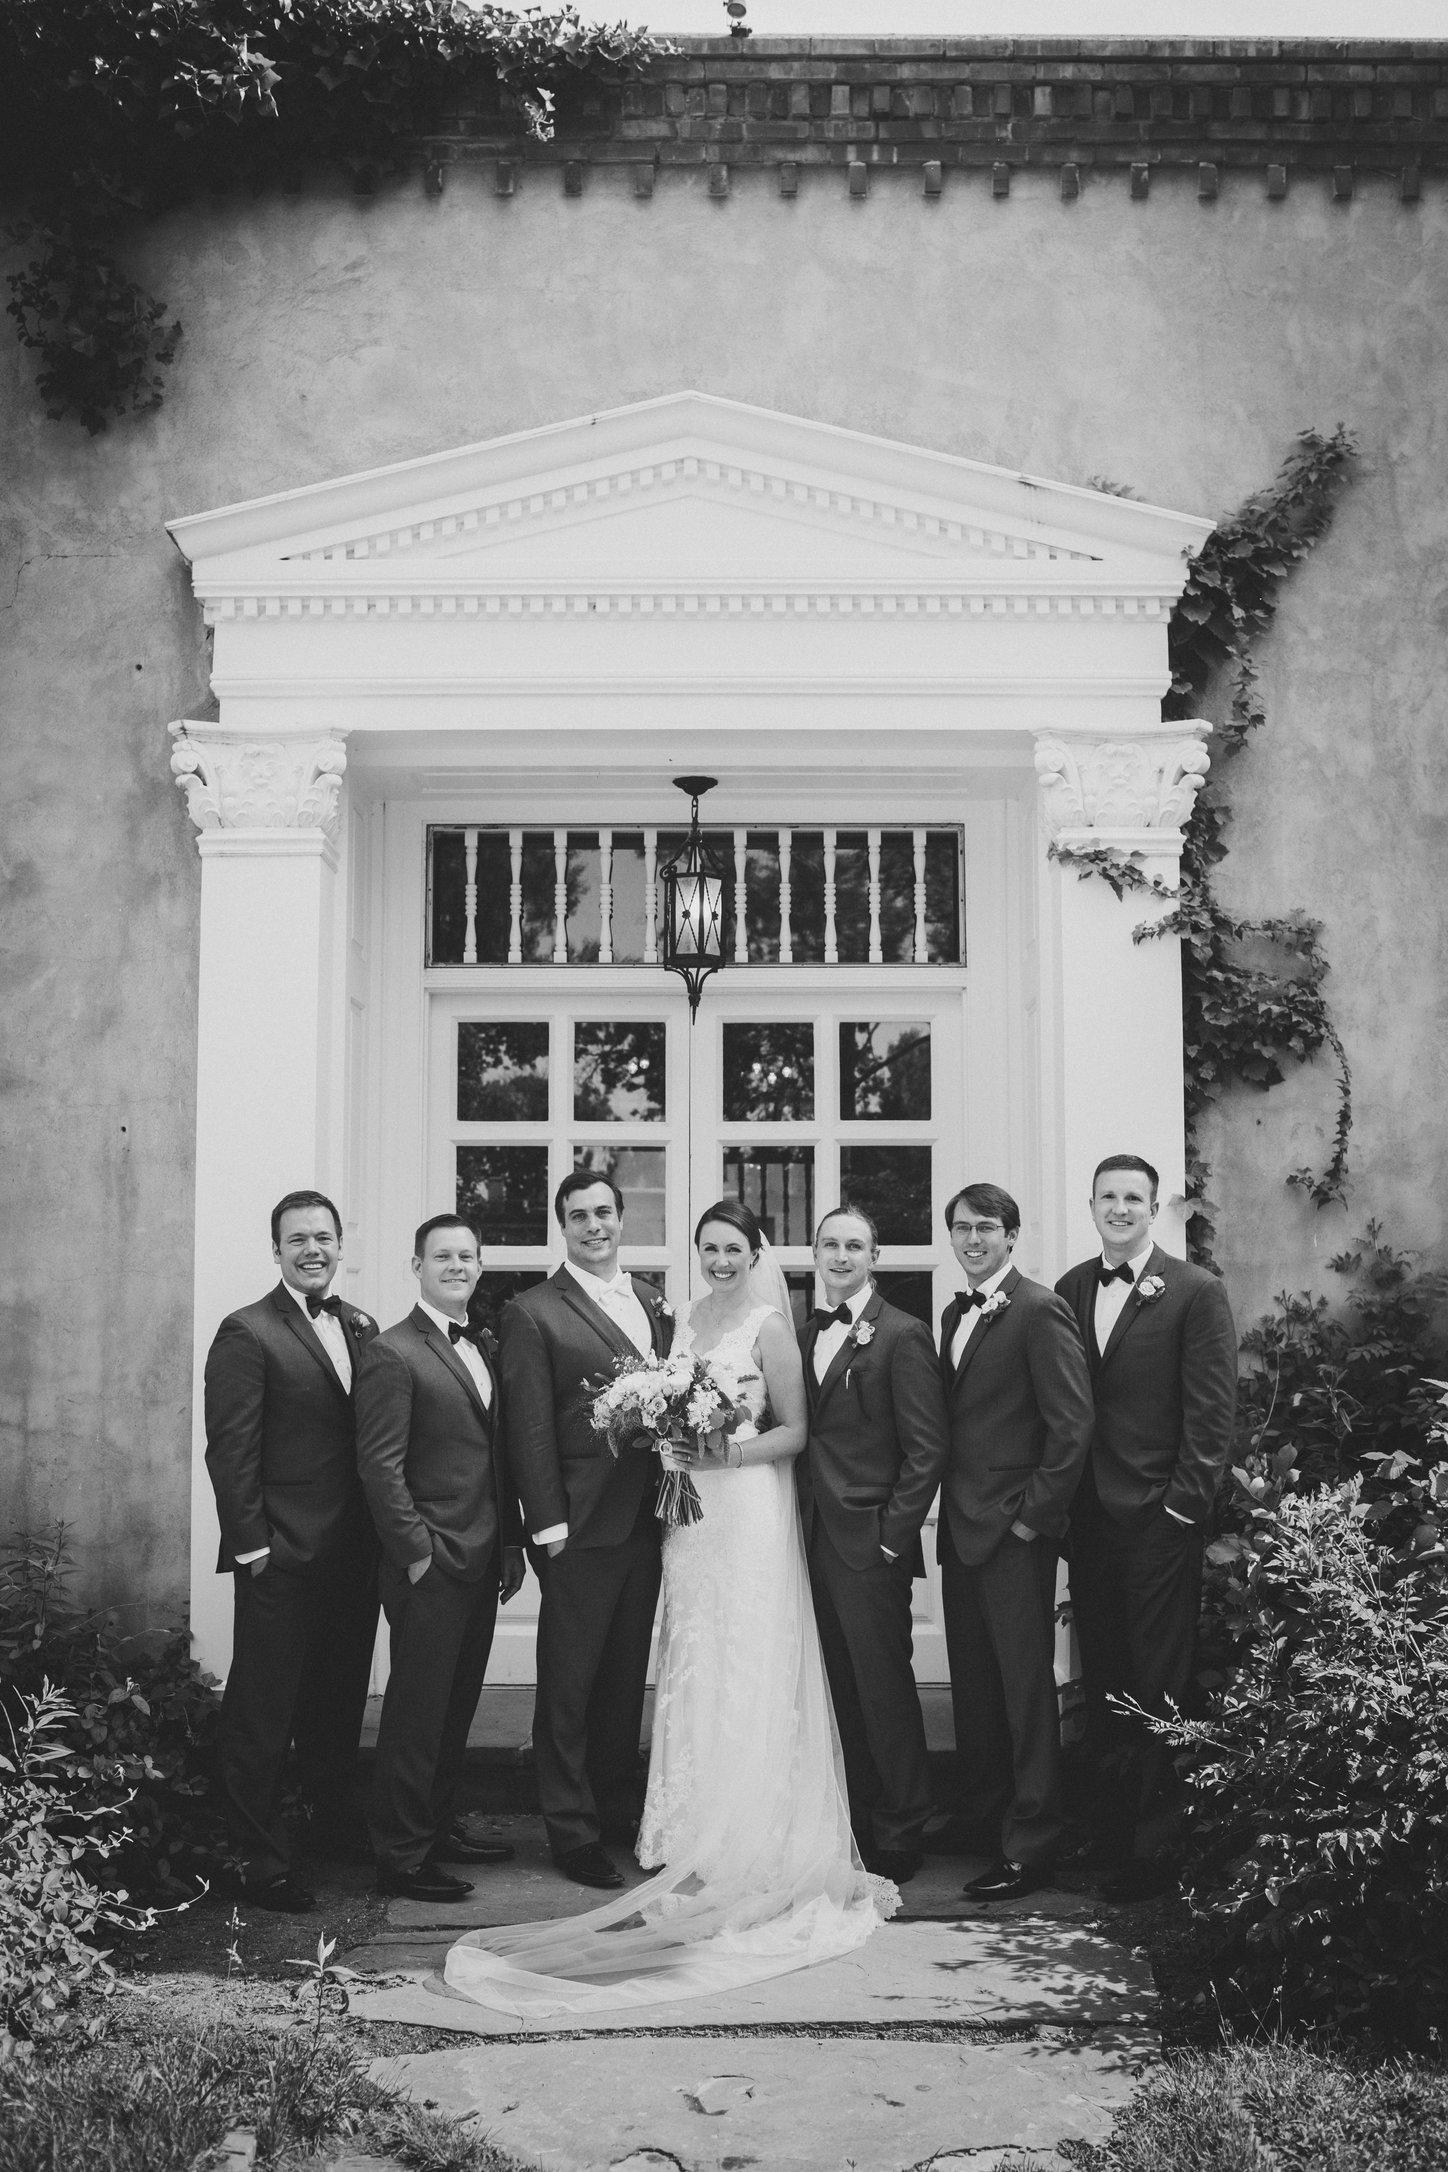 SandC-wedding-350.jpg